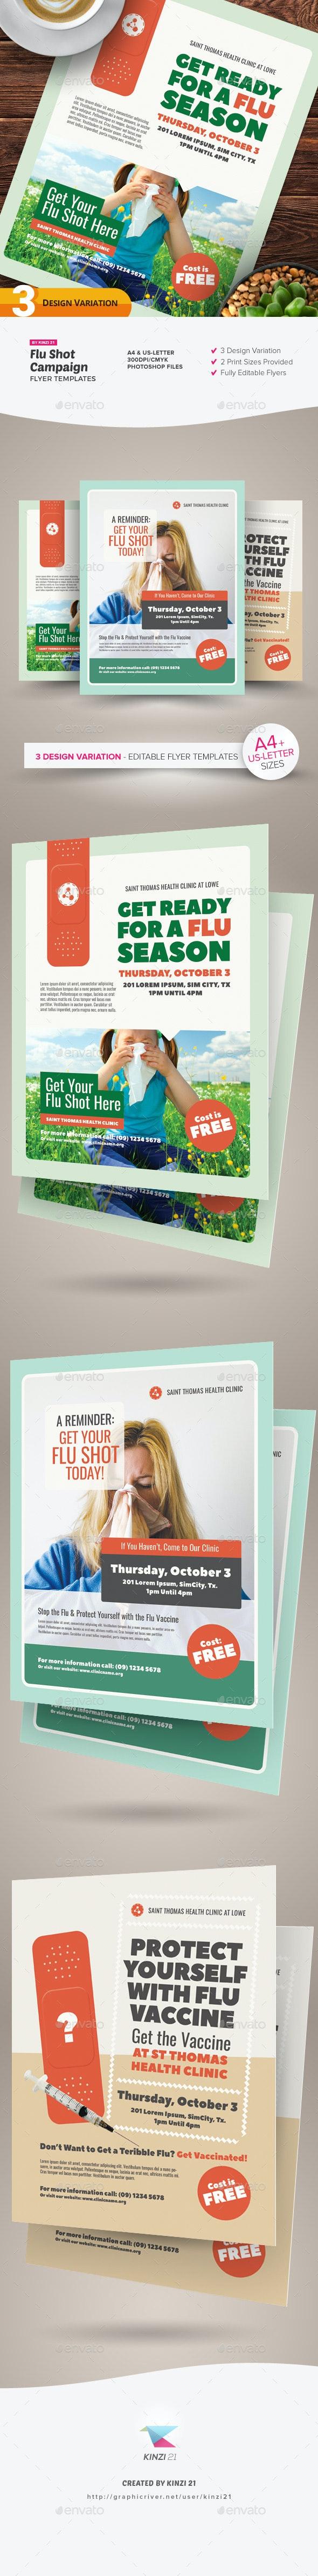 Flu Shot Campaign Flyer Templates - Miscellaneous Events